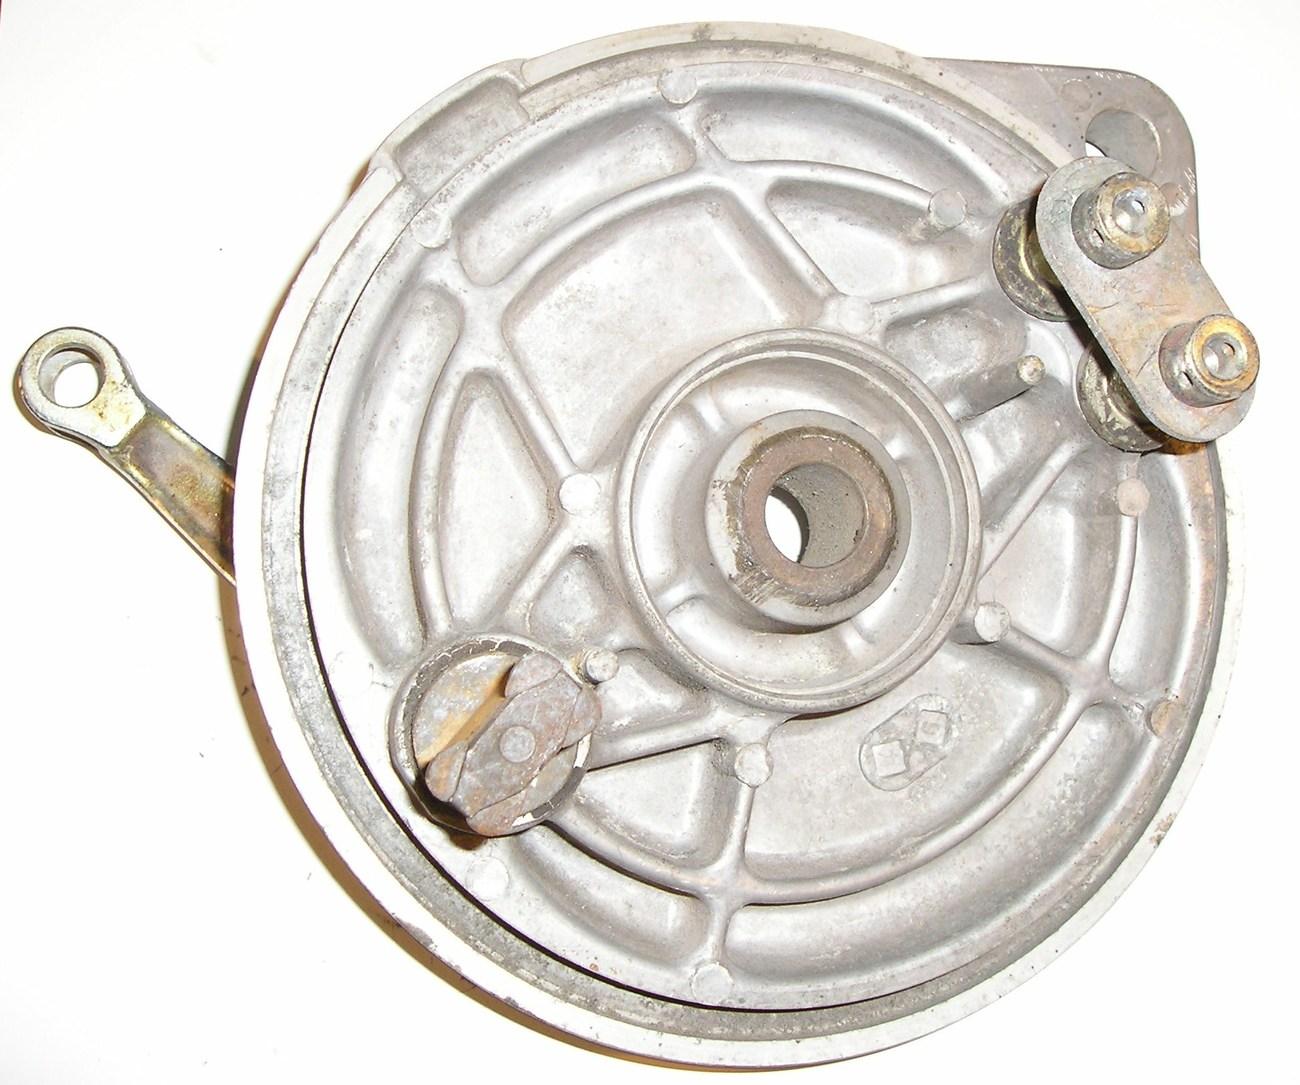 Honda VF500C Magna '84 rear brake panel